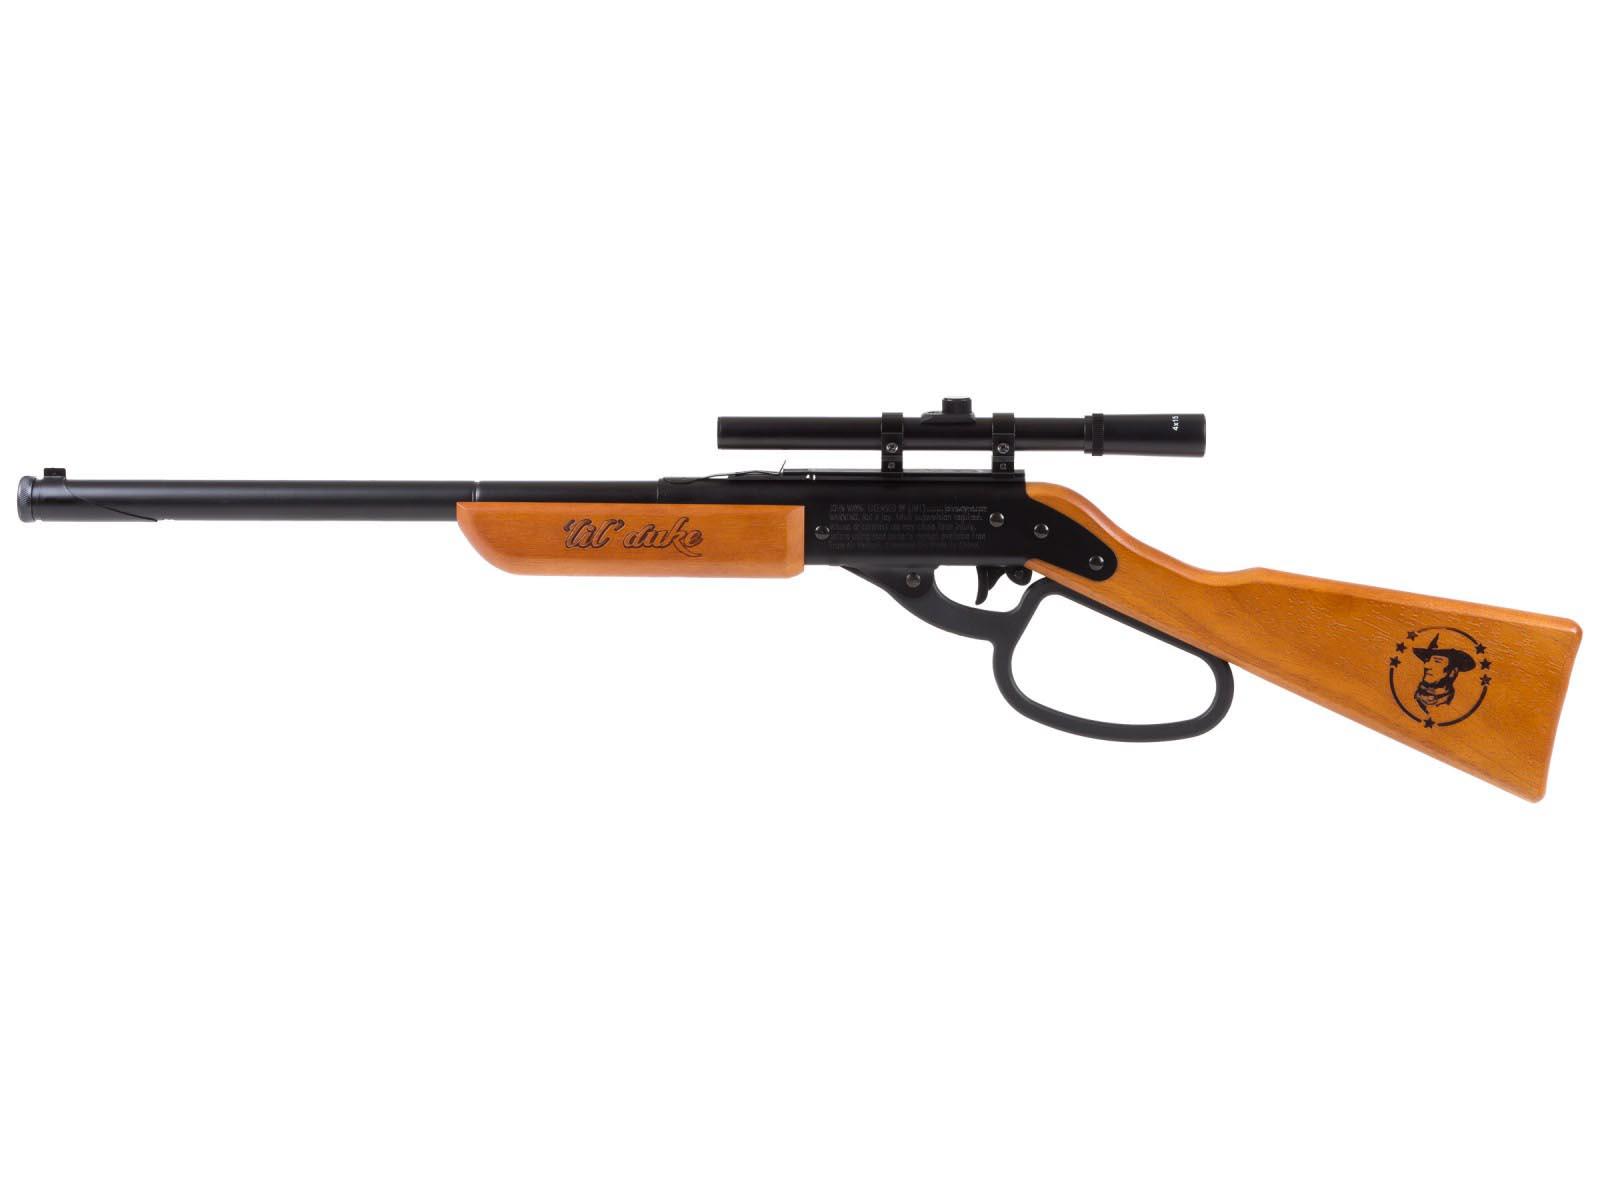 John Wayne Lil Duke BB Rifle + Scope kit